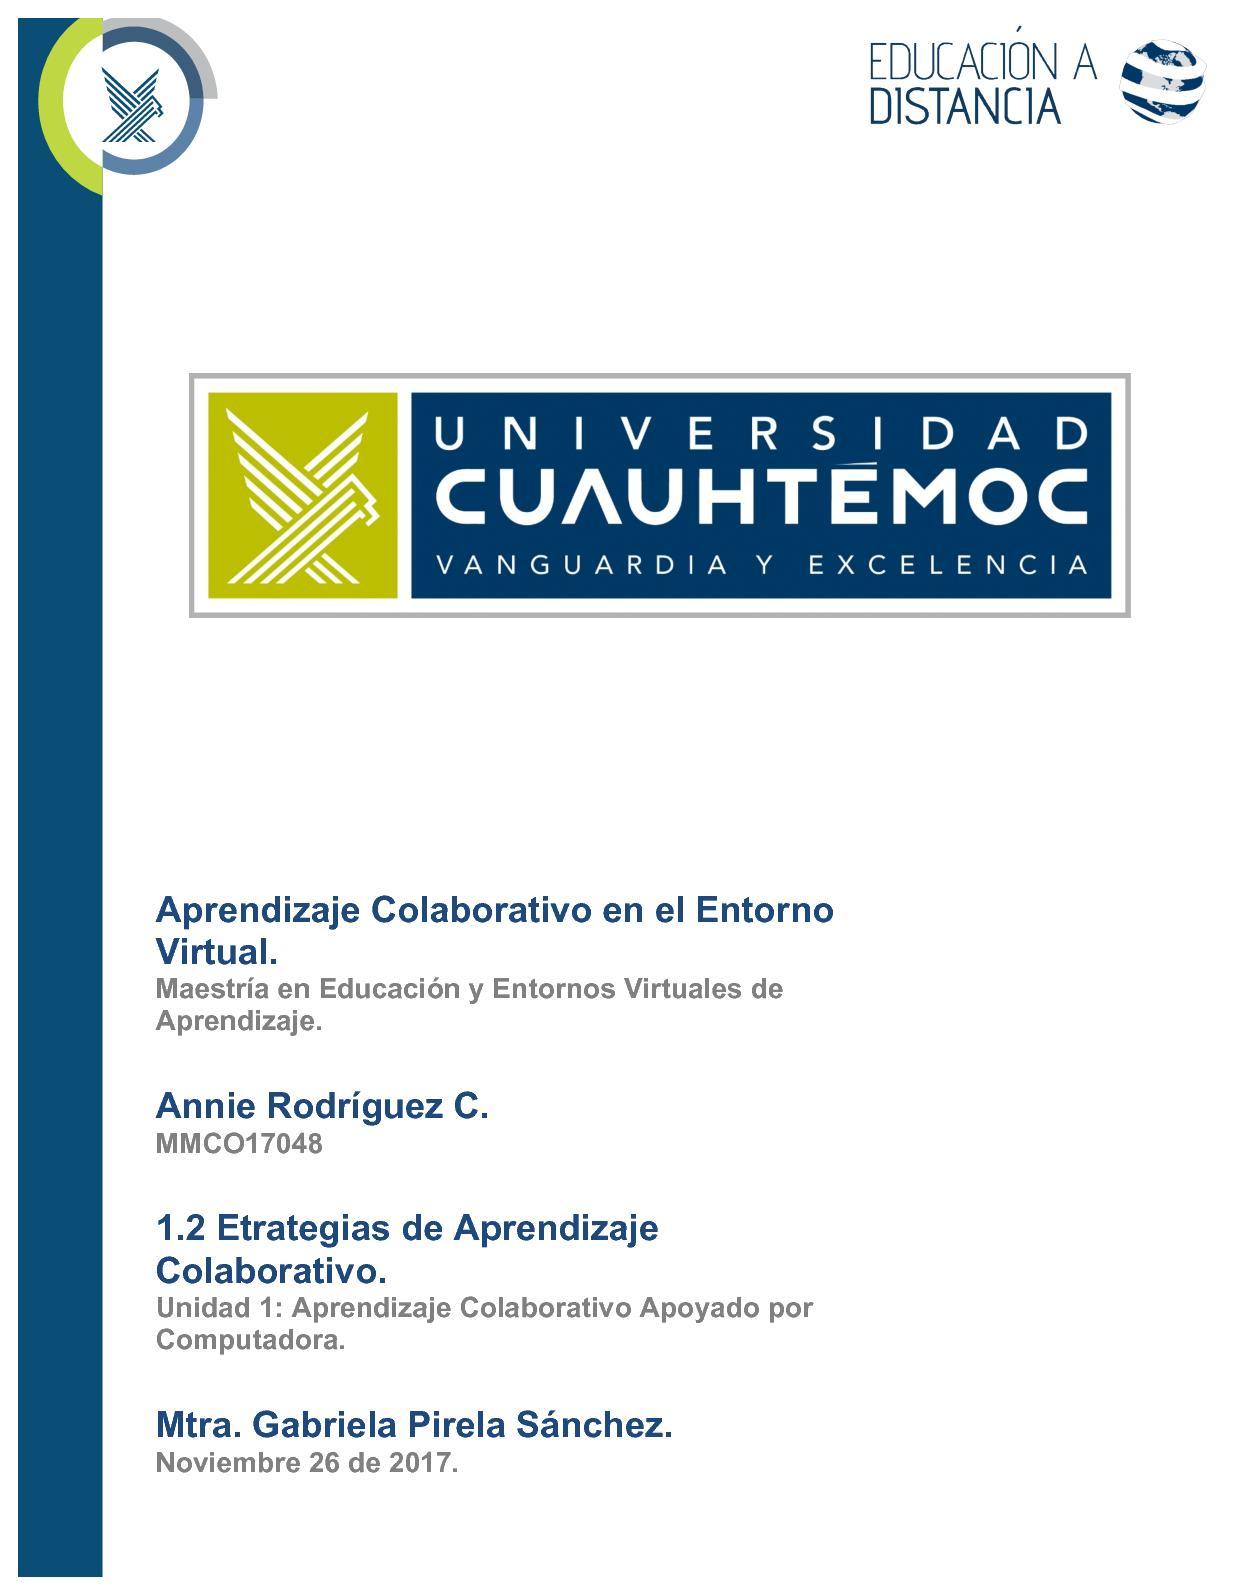 Estrategias De Aprendizaje Colaborativo. Annie Rodríguez C.